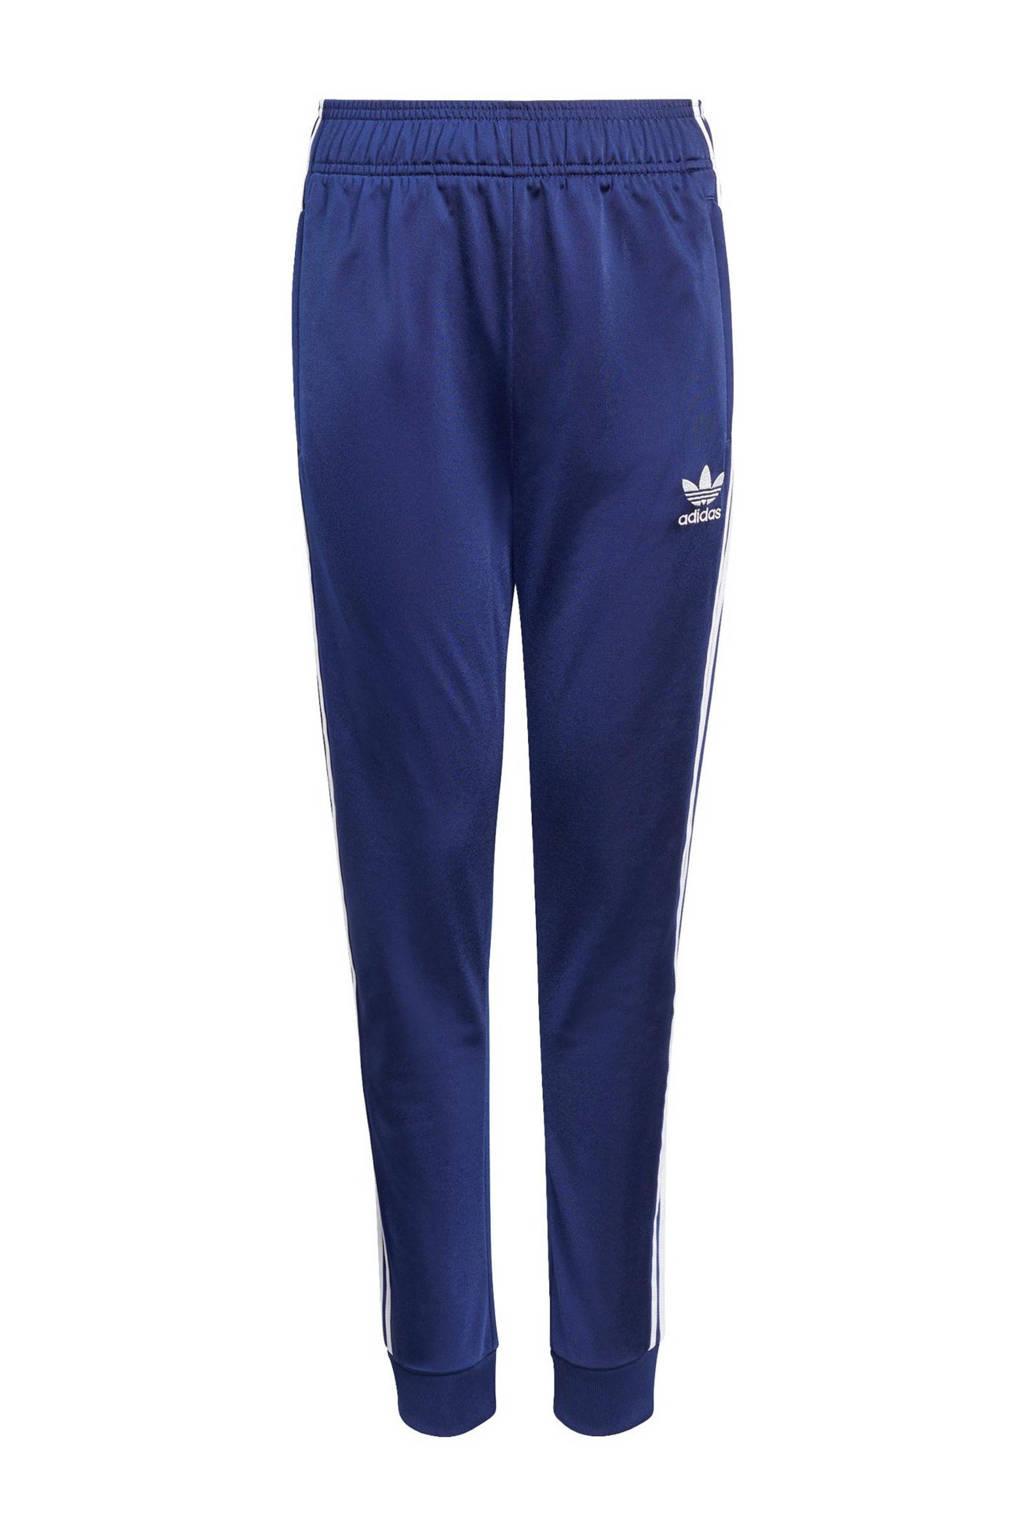 adidas Originals Super Star Adicolor trainingsbroek donkerblauw/wit, Donkerblauw/wit